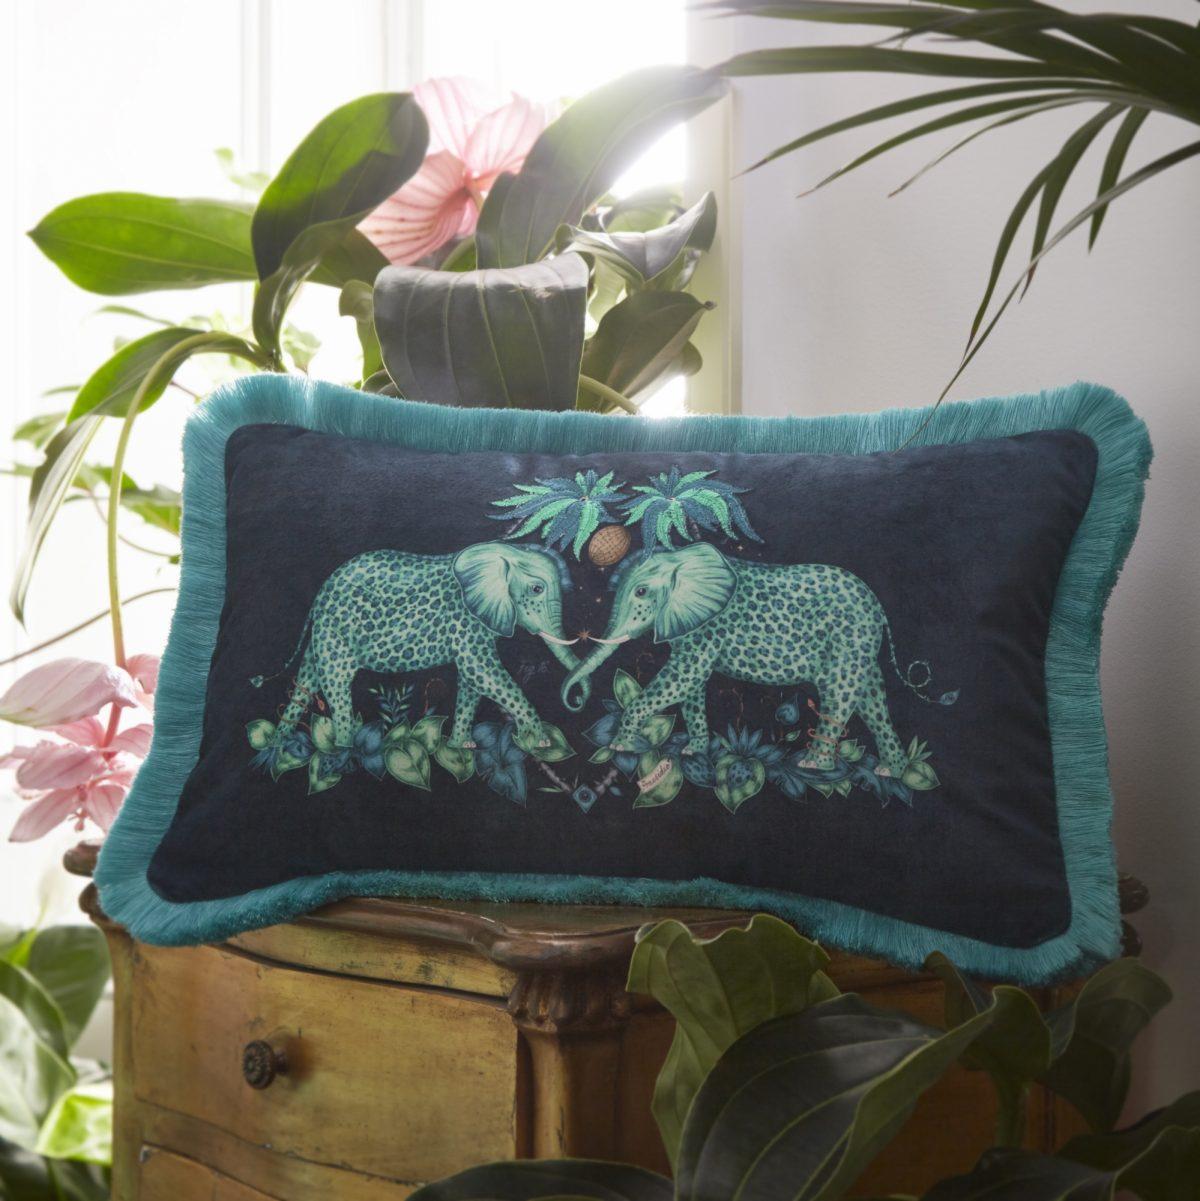 Emma Shippley Zambezi Cushion 02 No Usm